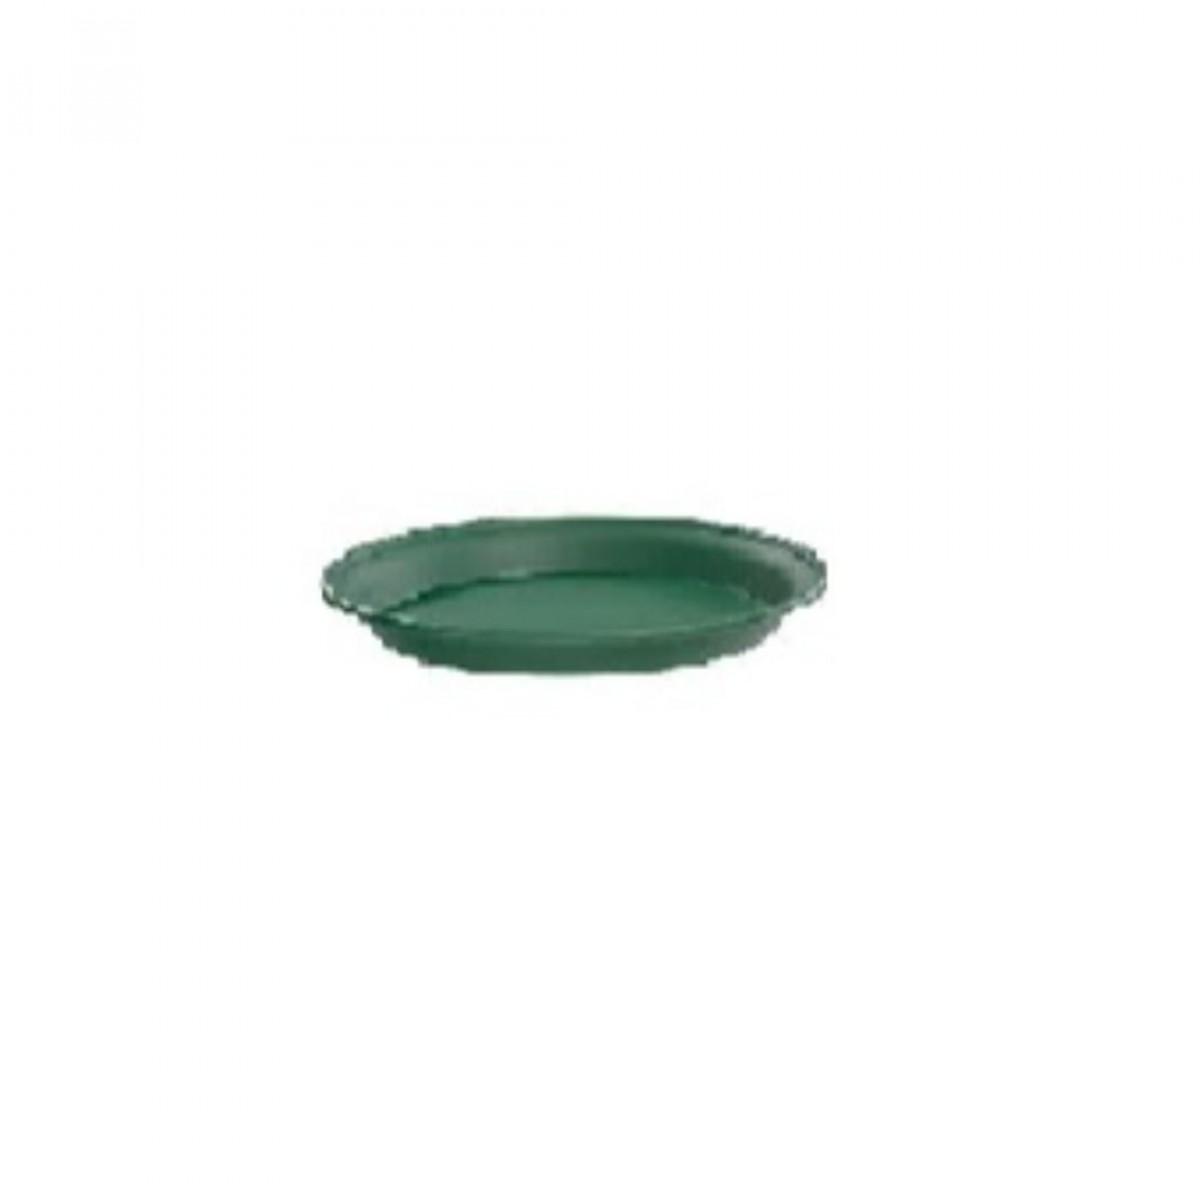 16CM Plastic Tray Green - 10 No